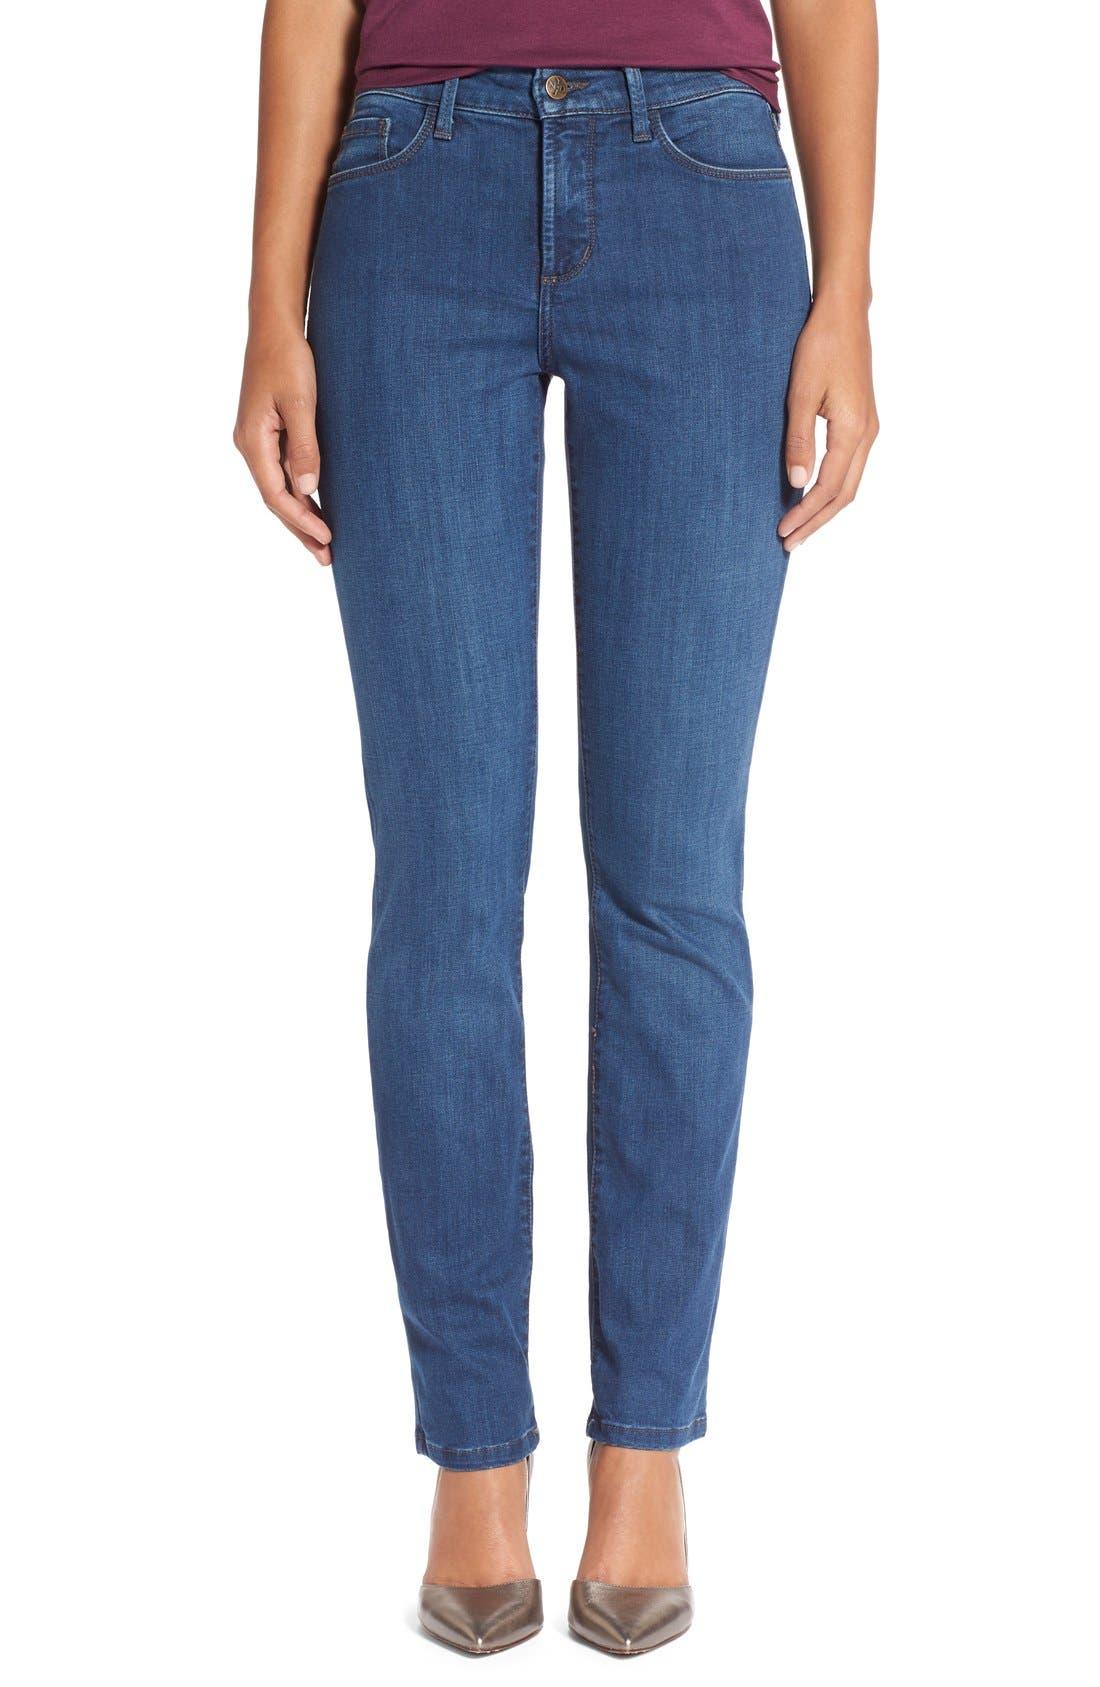 Main Image - NYDJ'Sheri' Stretch Skinny Jeans (Valencia)(Petite)